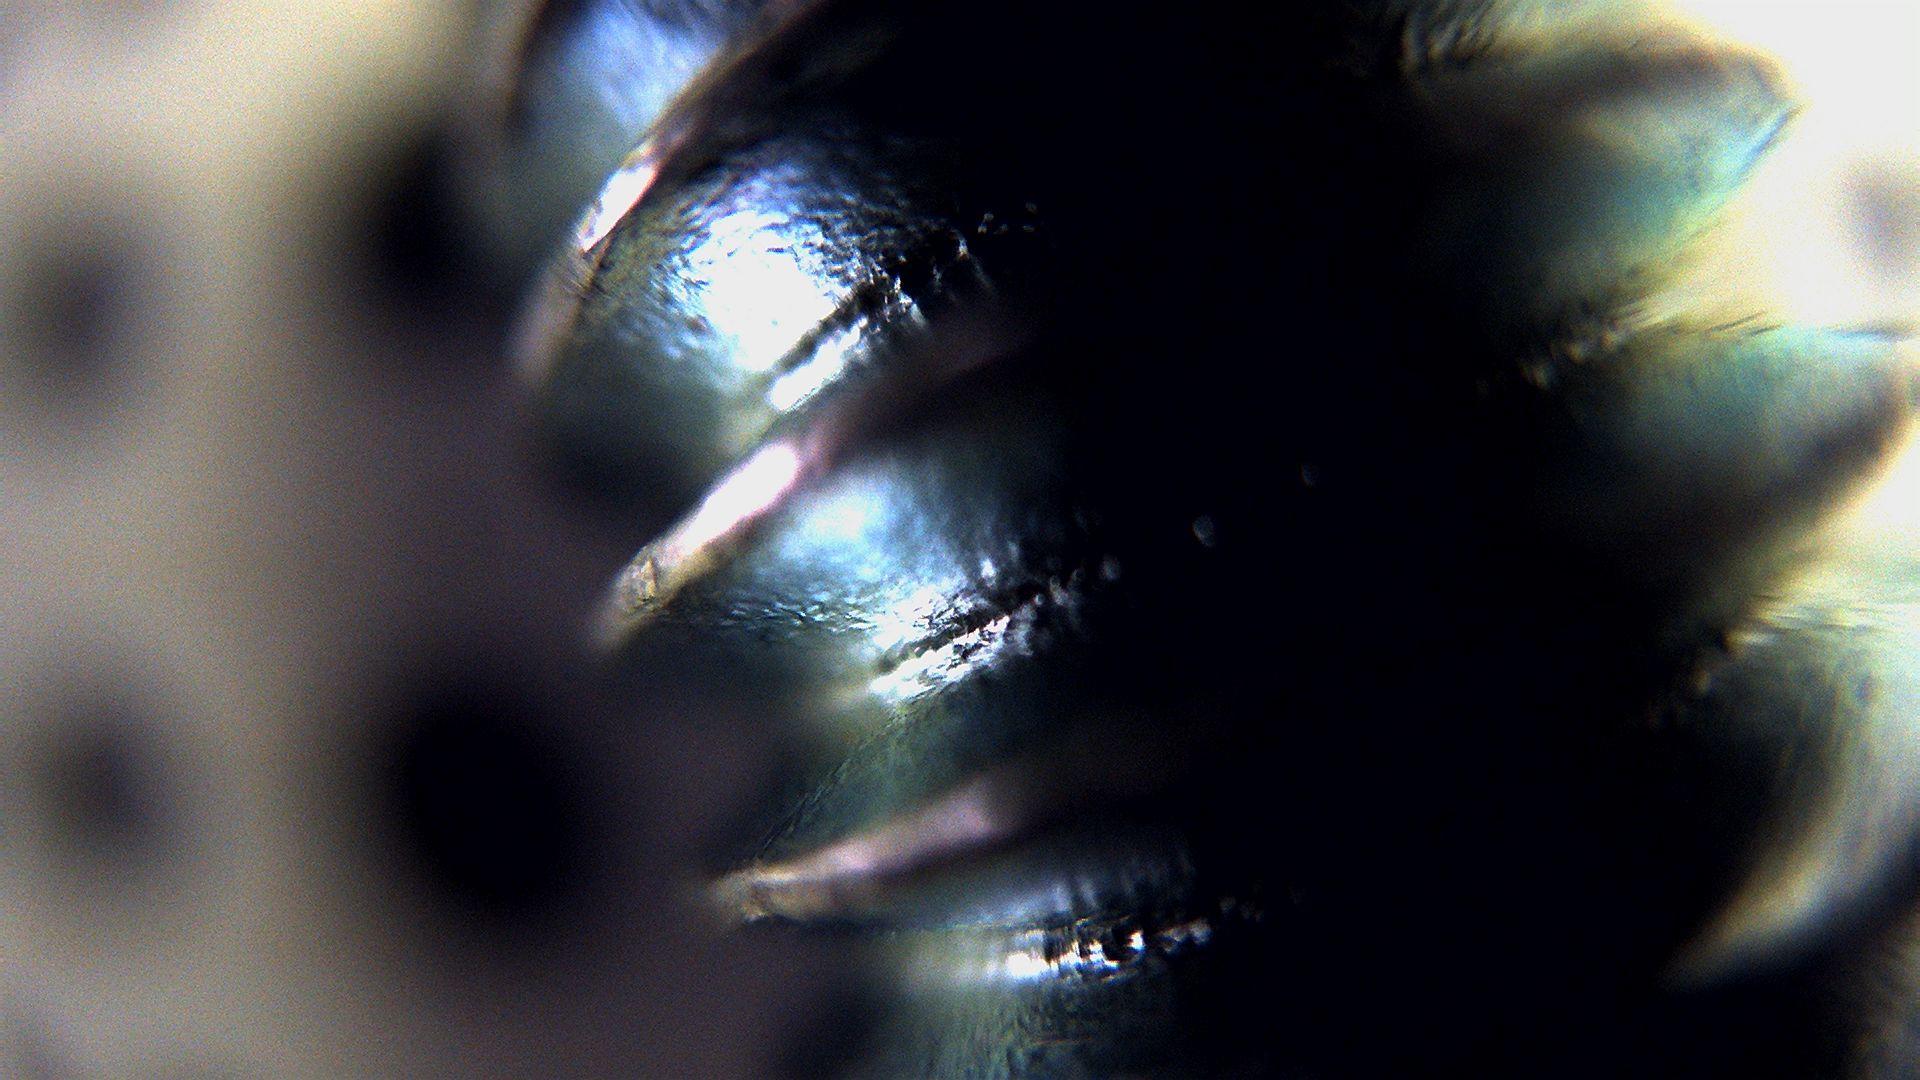 dfk-afux236-m12-svl-ir024524b5m-1mm.jpg